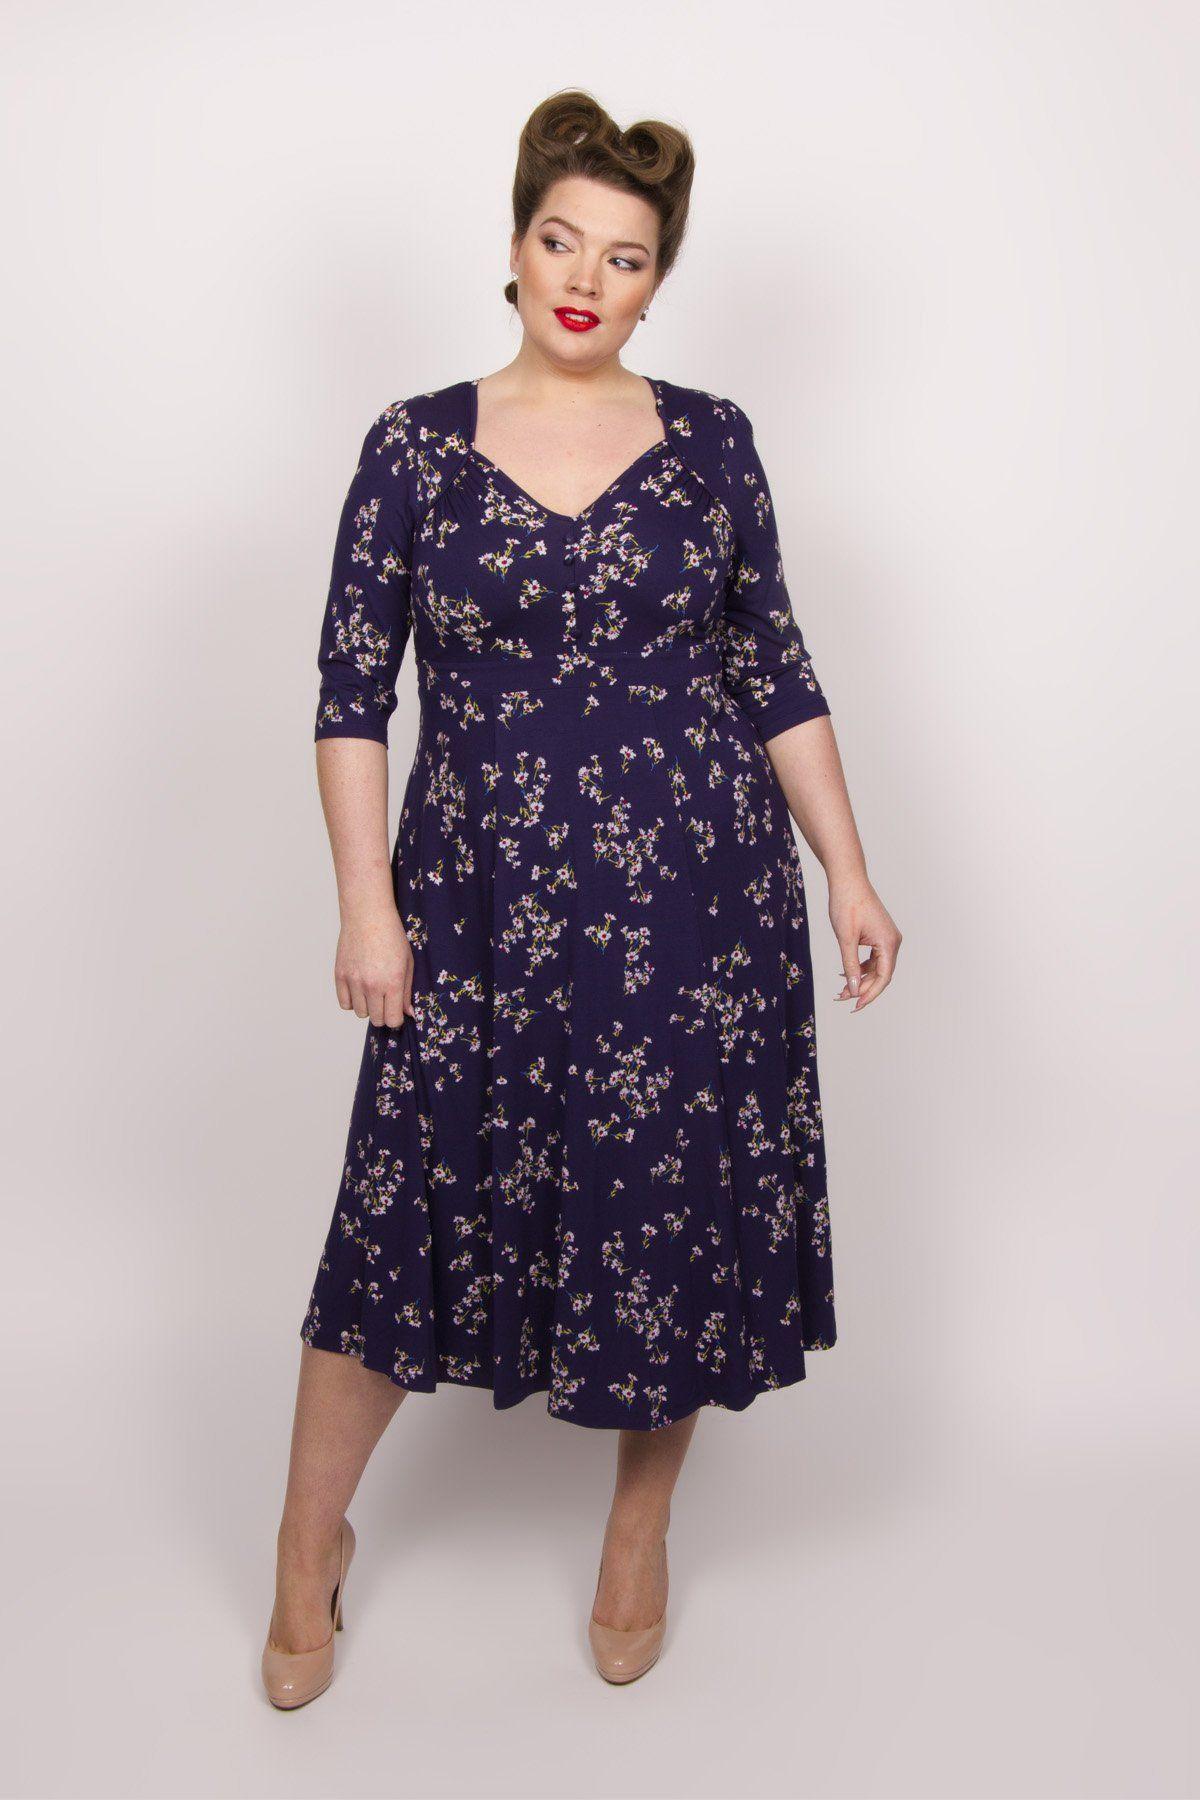 72ef3c8e36fc9 Iconic Ditsy Daisy 40 s Dress in 2018